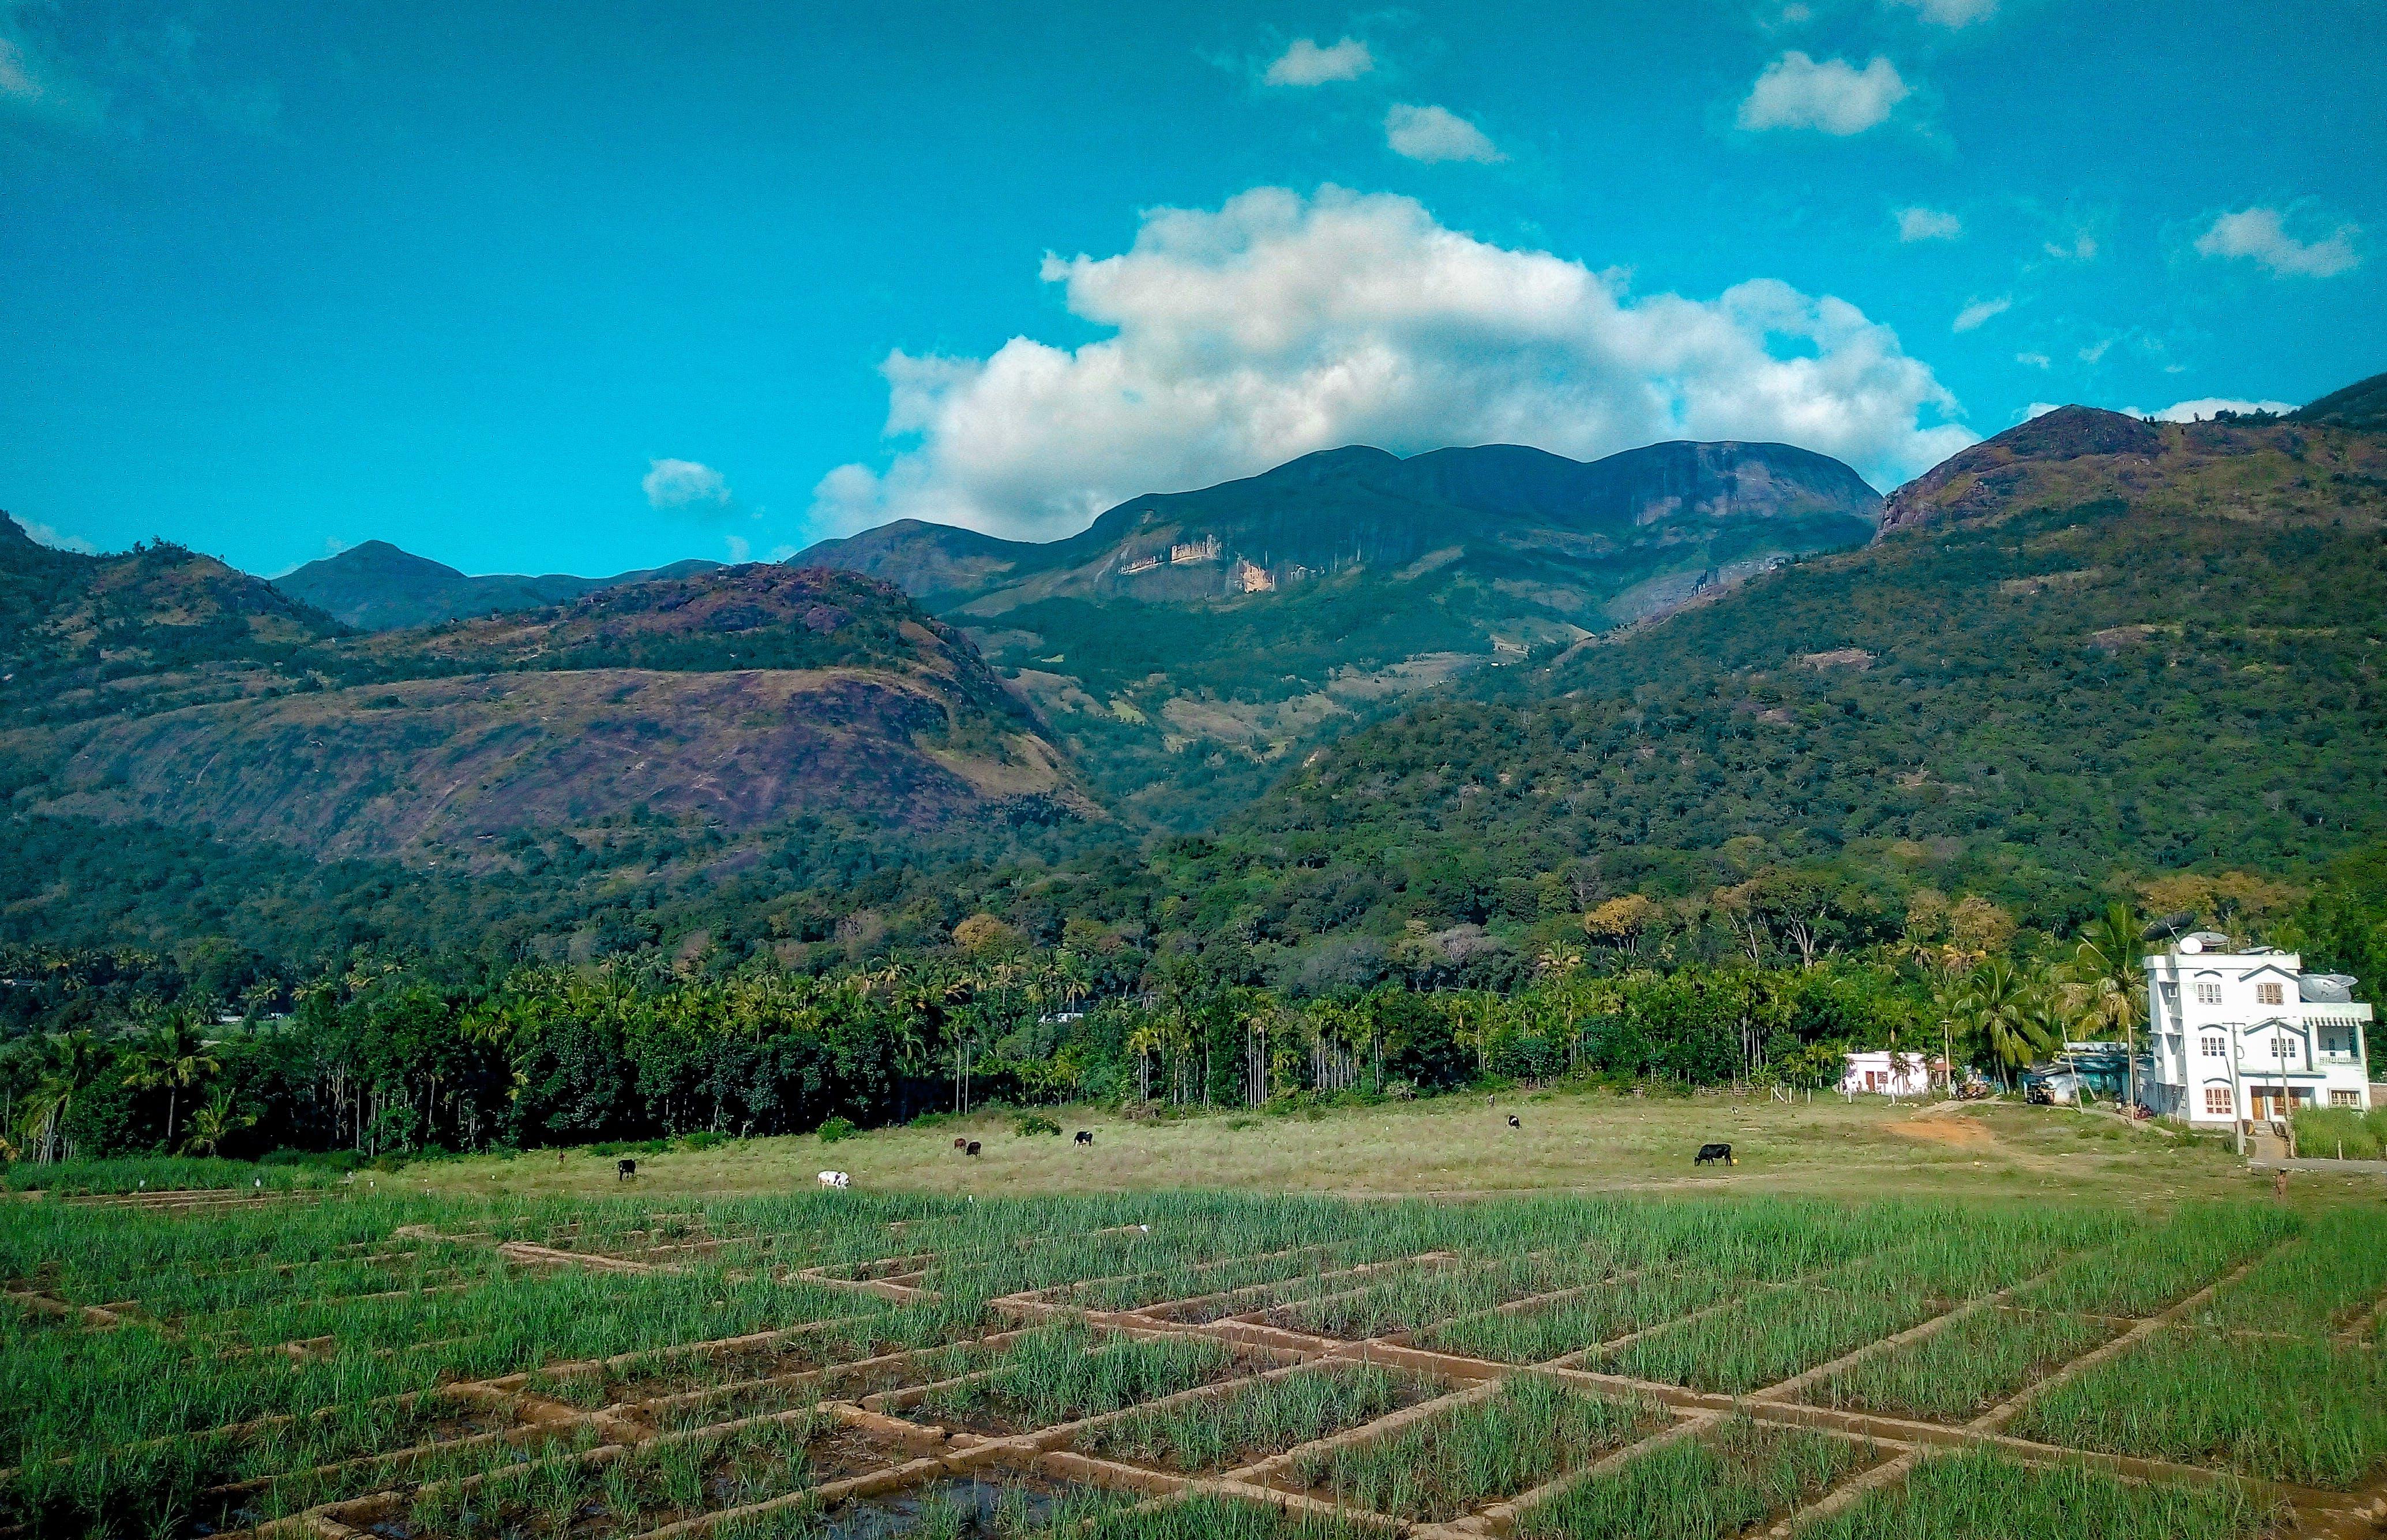 Rice Field Near Mountain at Daytime